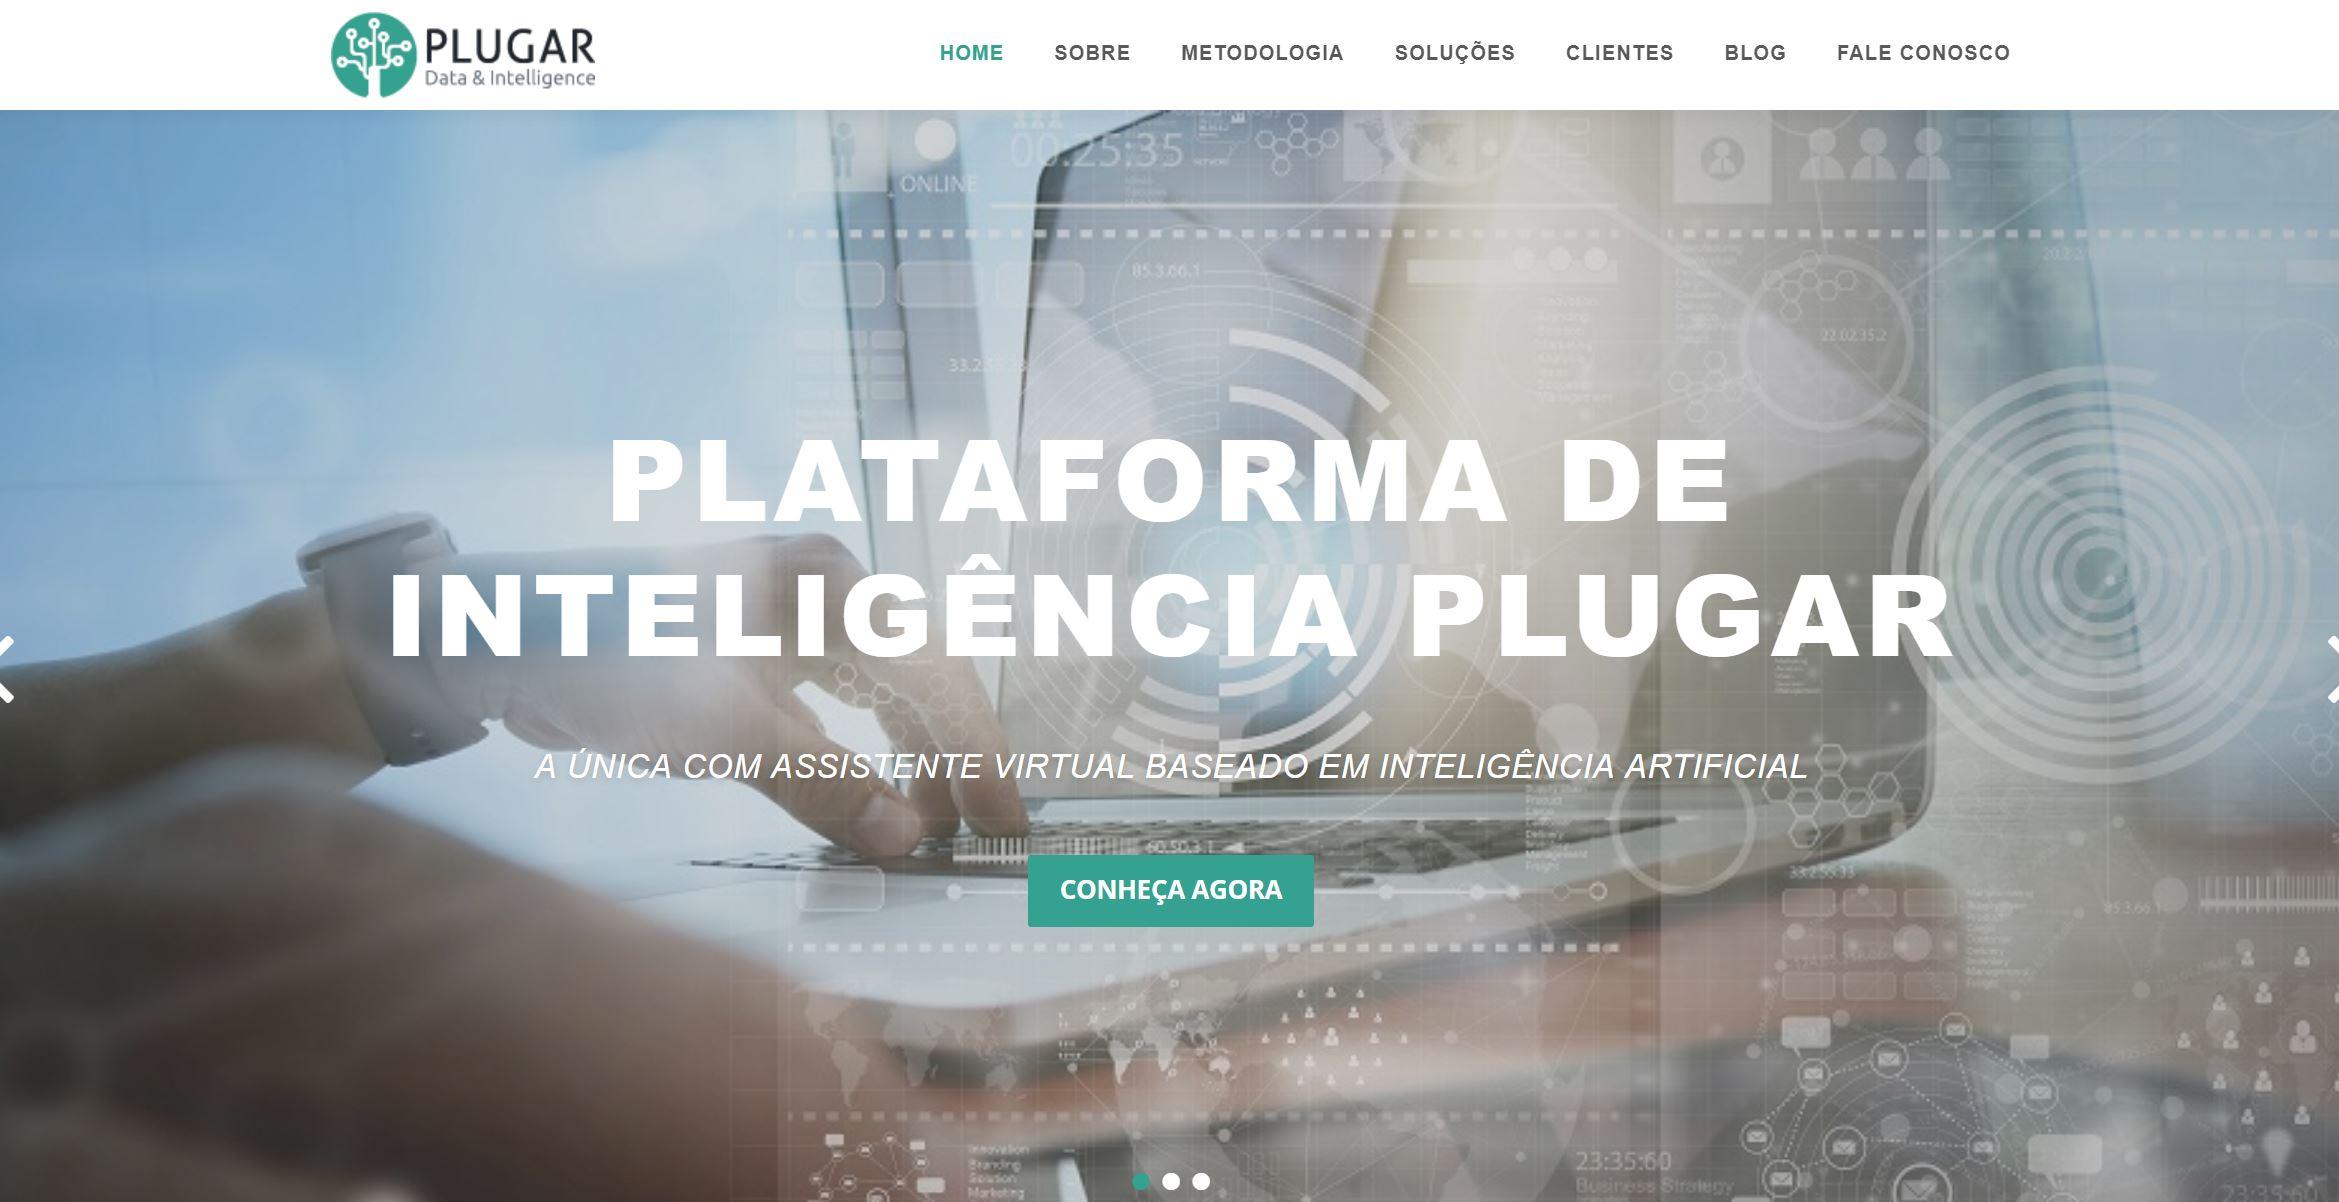 screenshot Plugar - Análise da concorrência